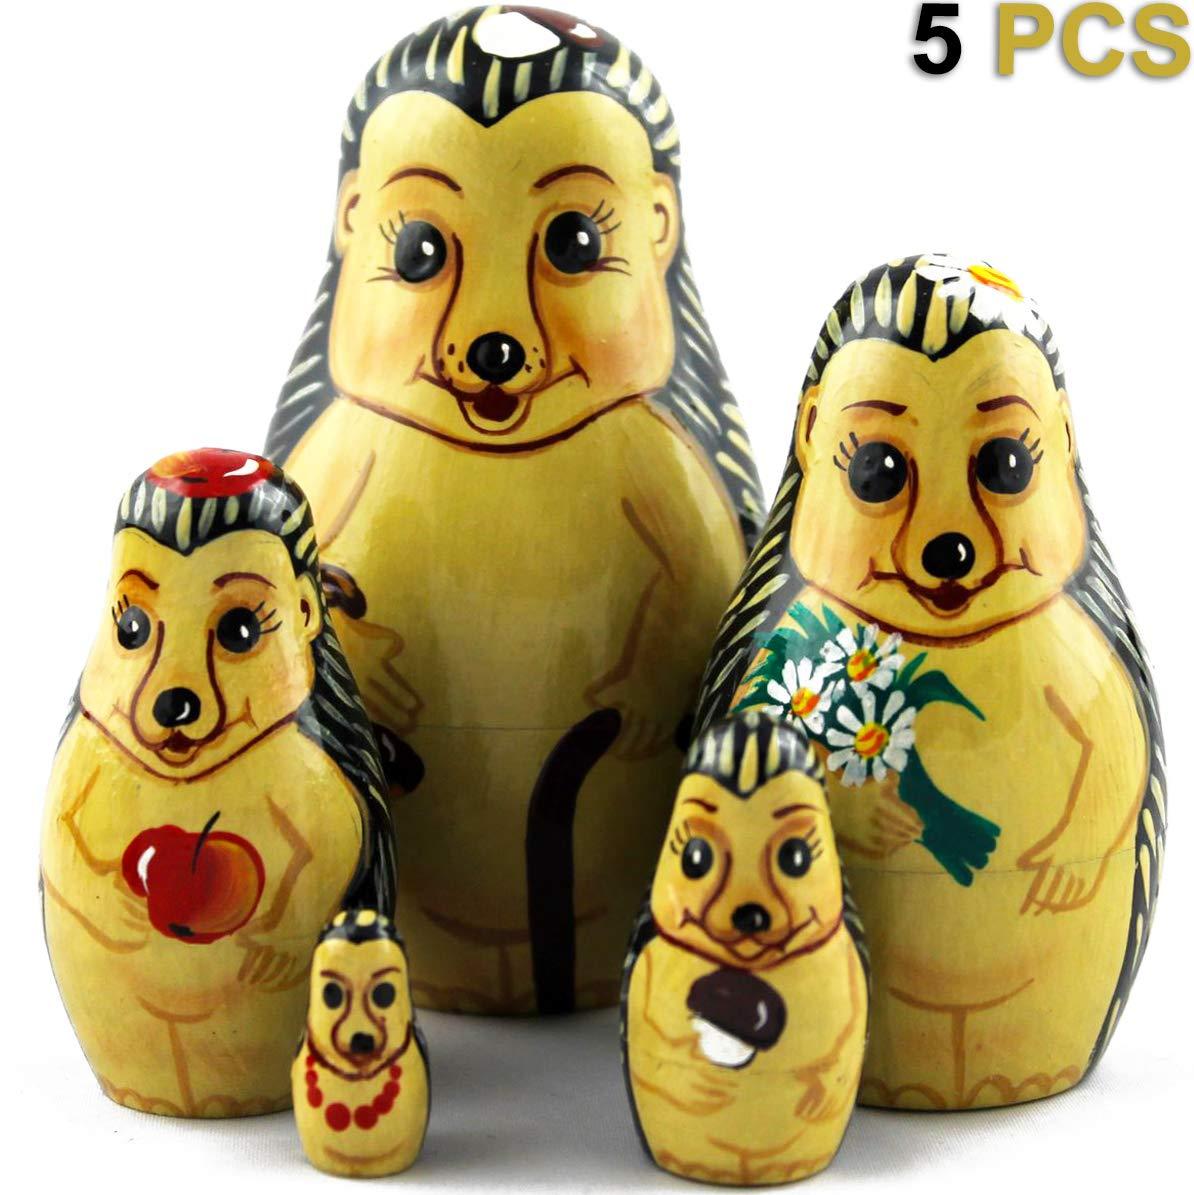 MATRYOSHKA&HANDICRAFT Nesting Dolls Hedgehogs Toys Set 5 pcs - Hedgehogs Animal Figurines by MATRYOSHKA&HANDICRAFT